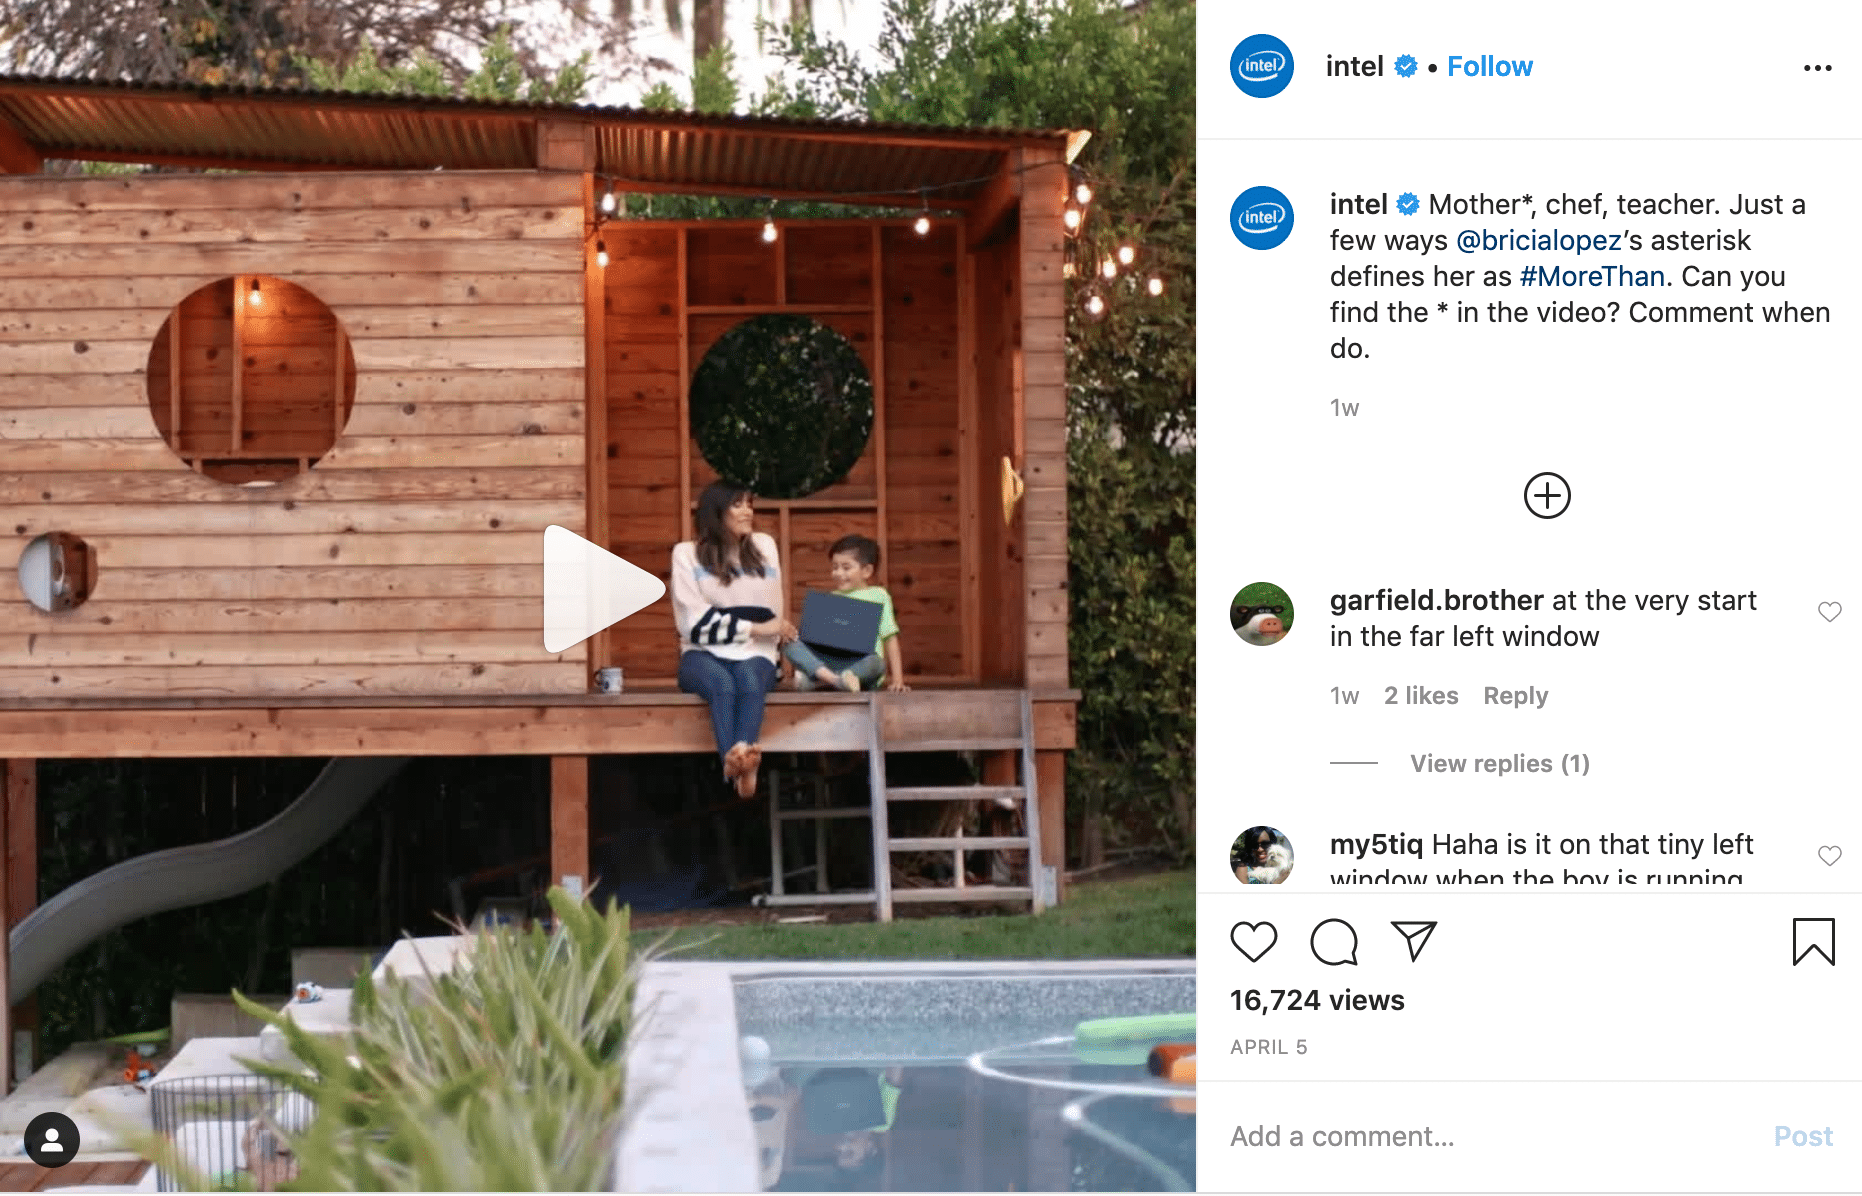 Intel - Mother, chef, teacher video